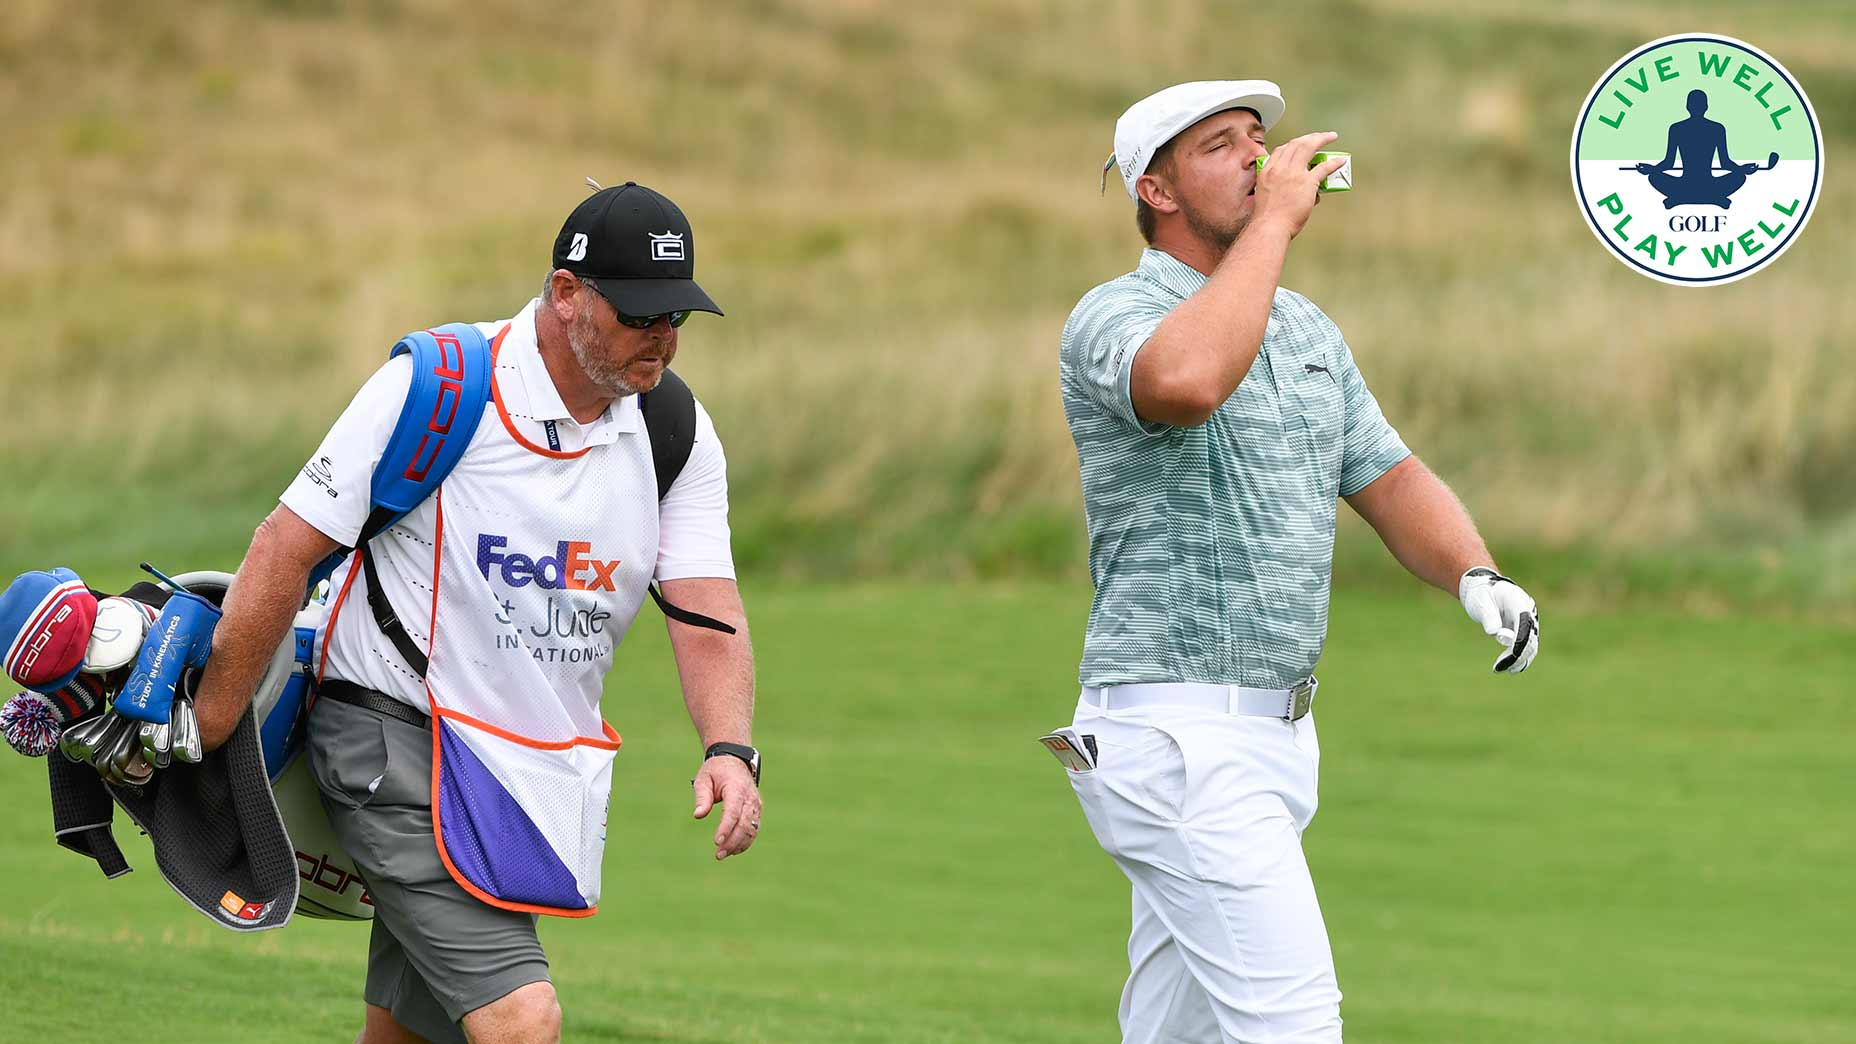 Bryson DeChambeau sparked a great protein debate among golfers.